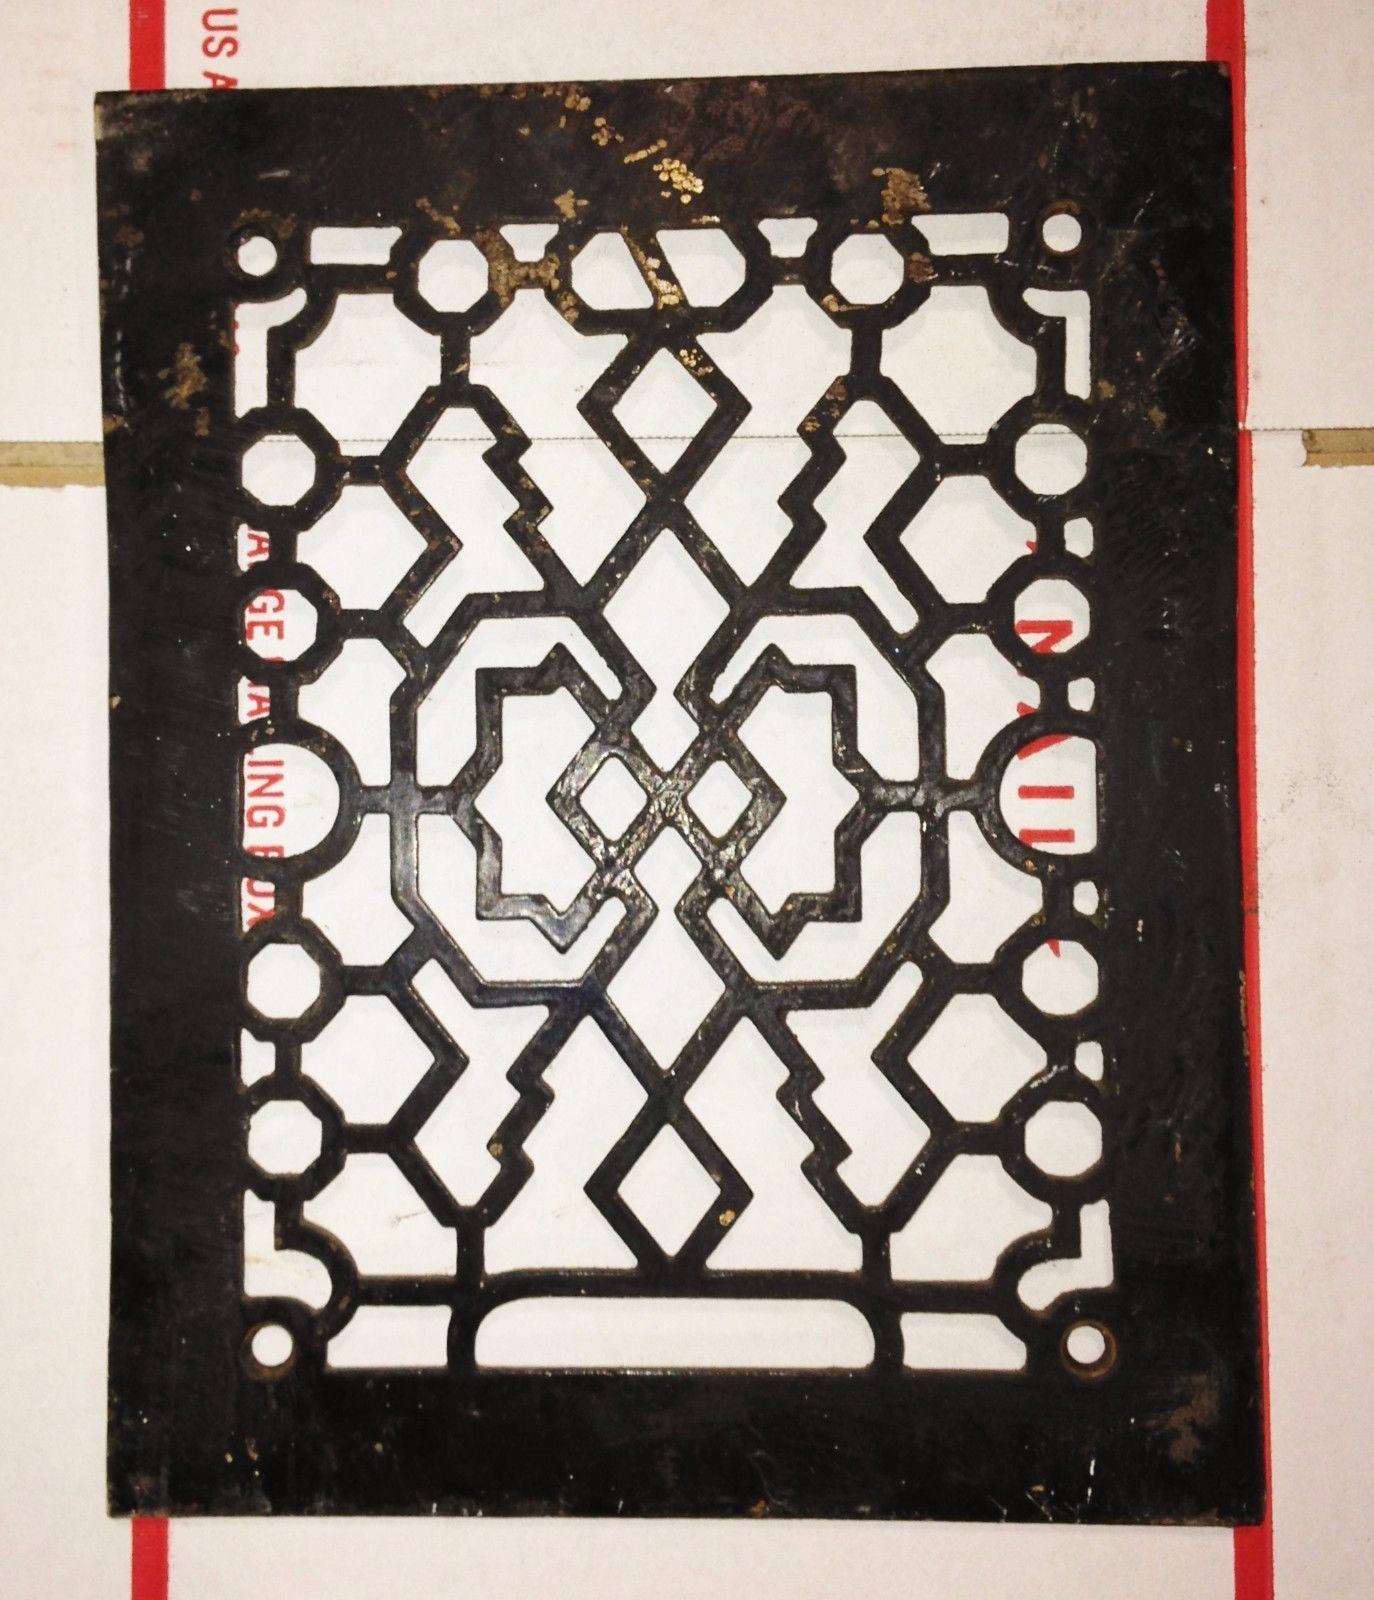 Decorative Metal Grates Antique Cast Iron Heating Grate Register Vent Cover Fancy Pattern